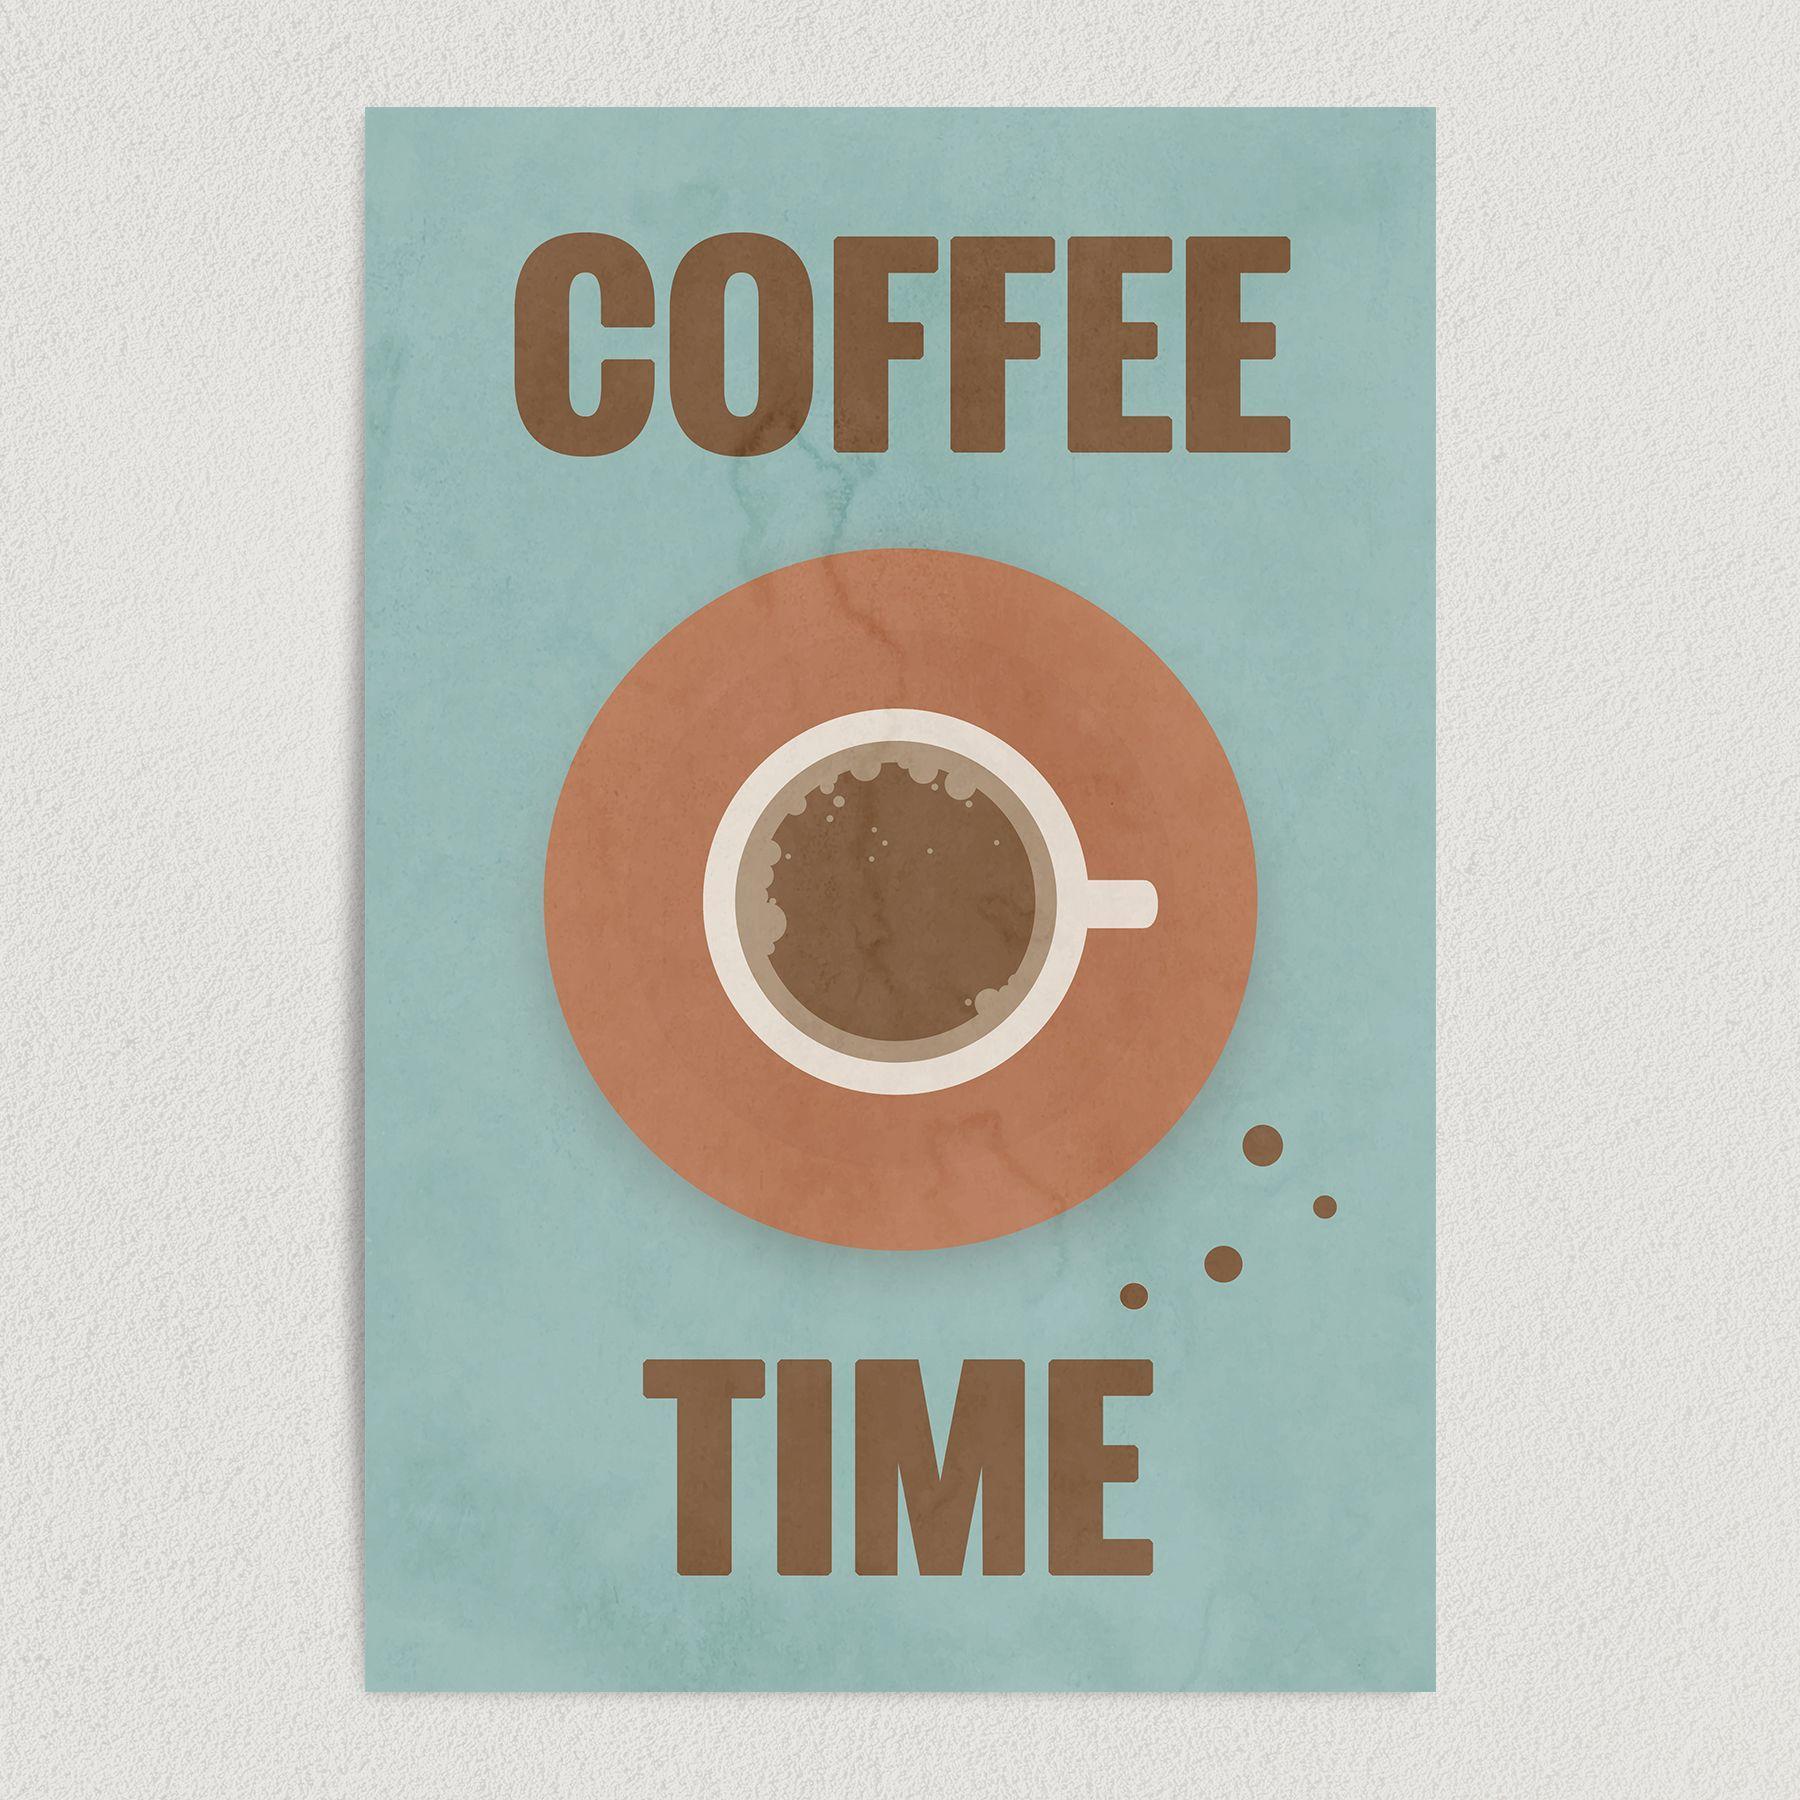 Coffee Time Art Print Poster 12″ x 18″ Wall Art FB1000